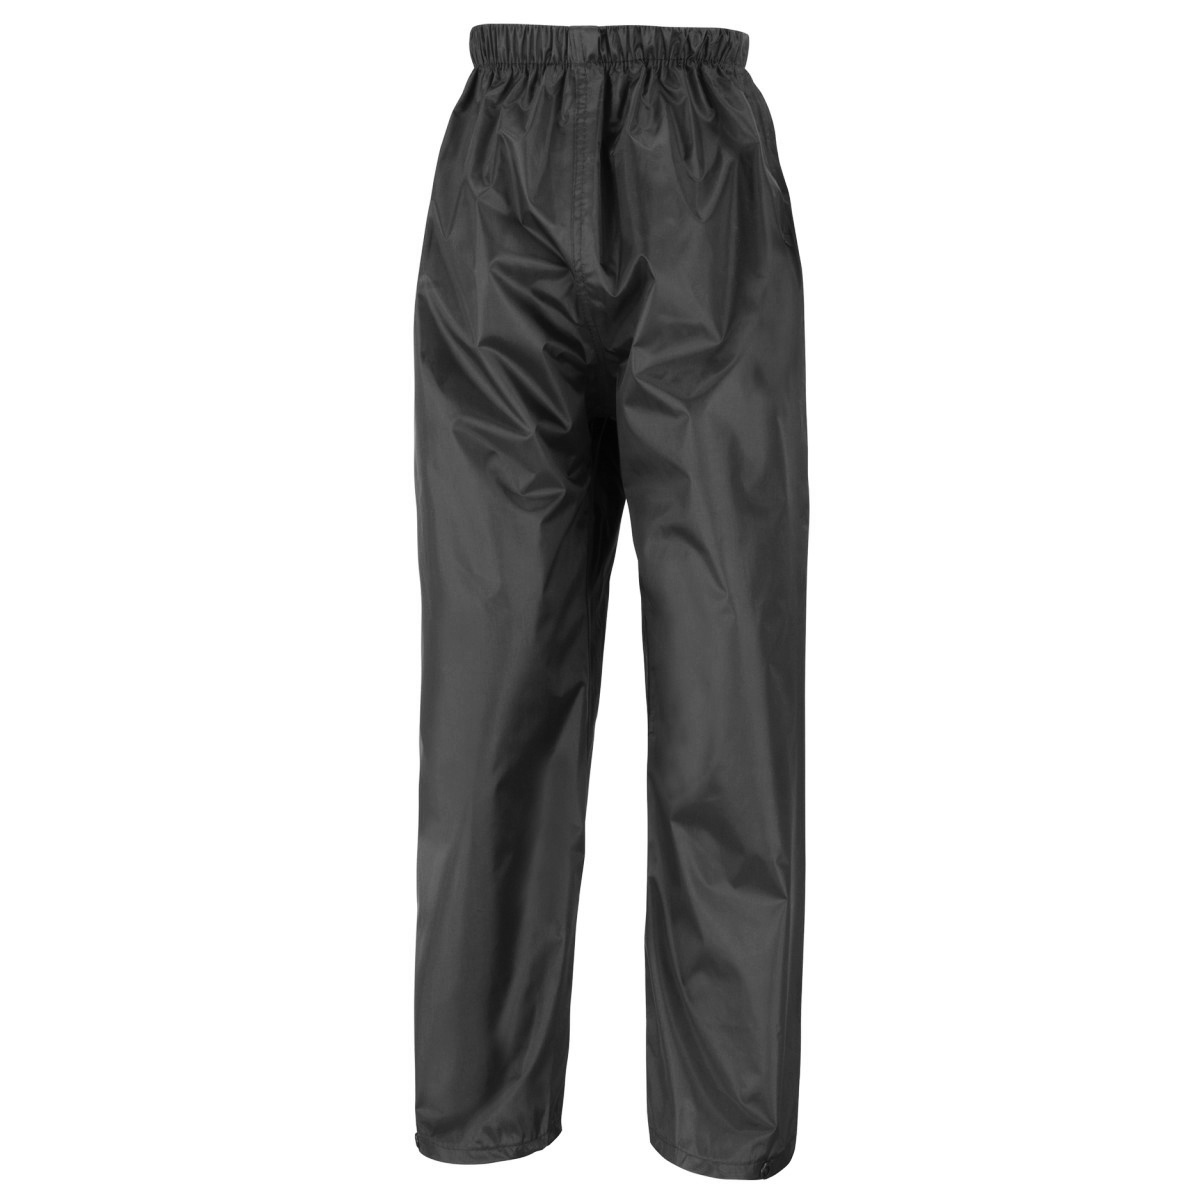 Result Mens Core Stormdri Rain Over Trousers / Pants (2XL) (Black)